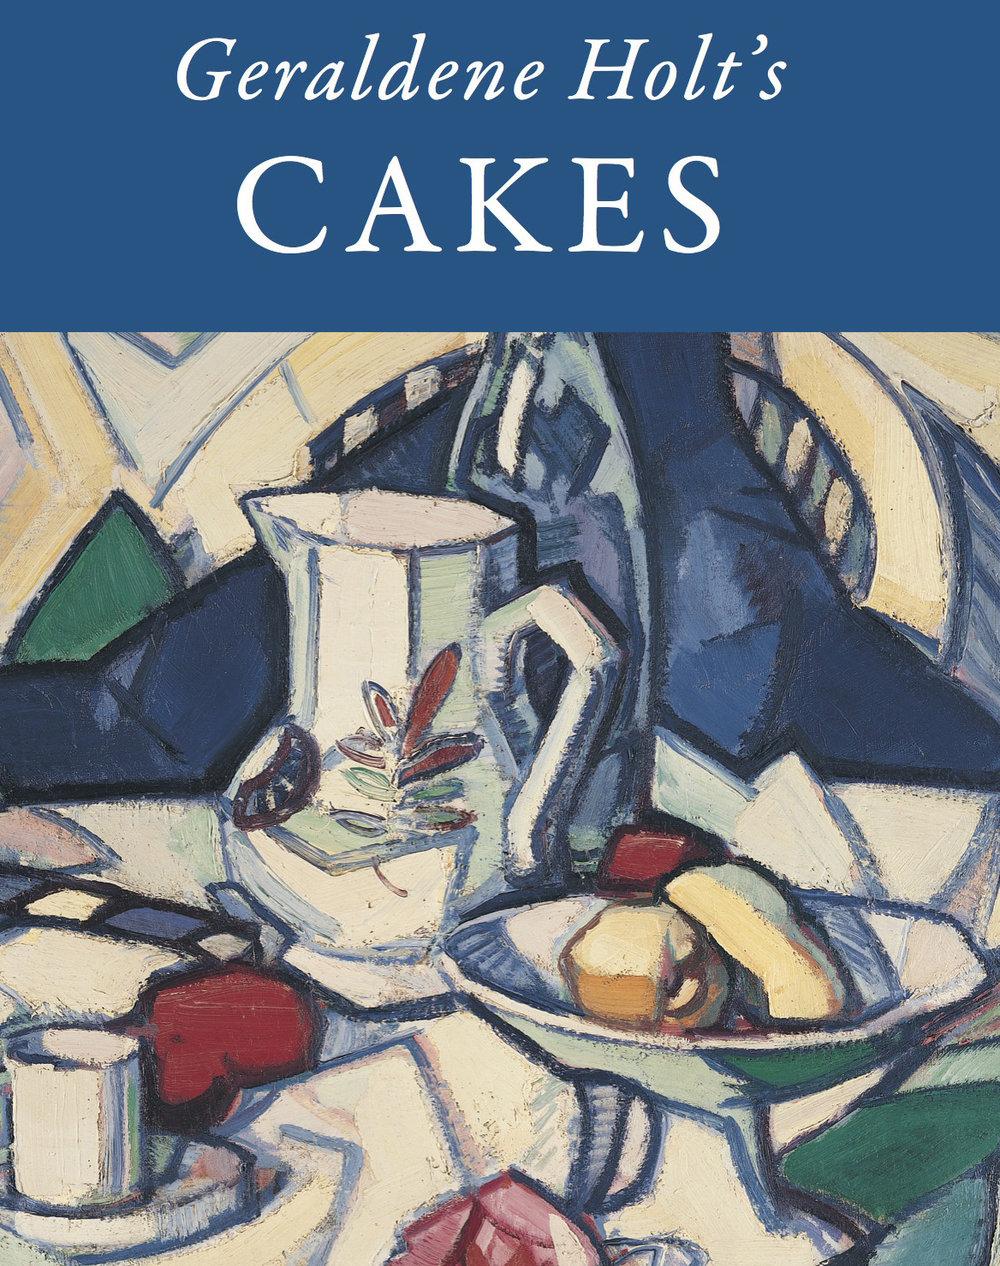 Prospect Books - Cakes- 9781903018750 crop.jpg